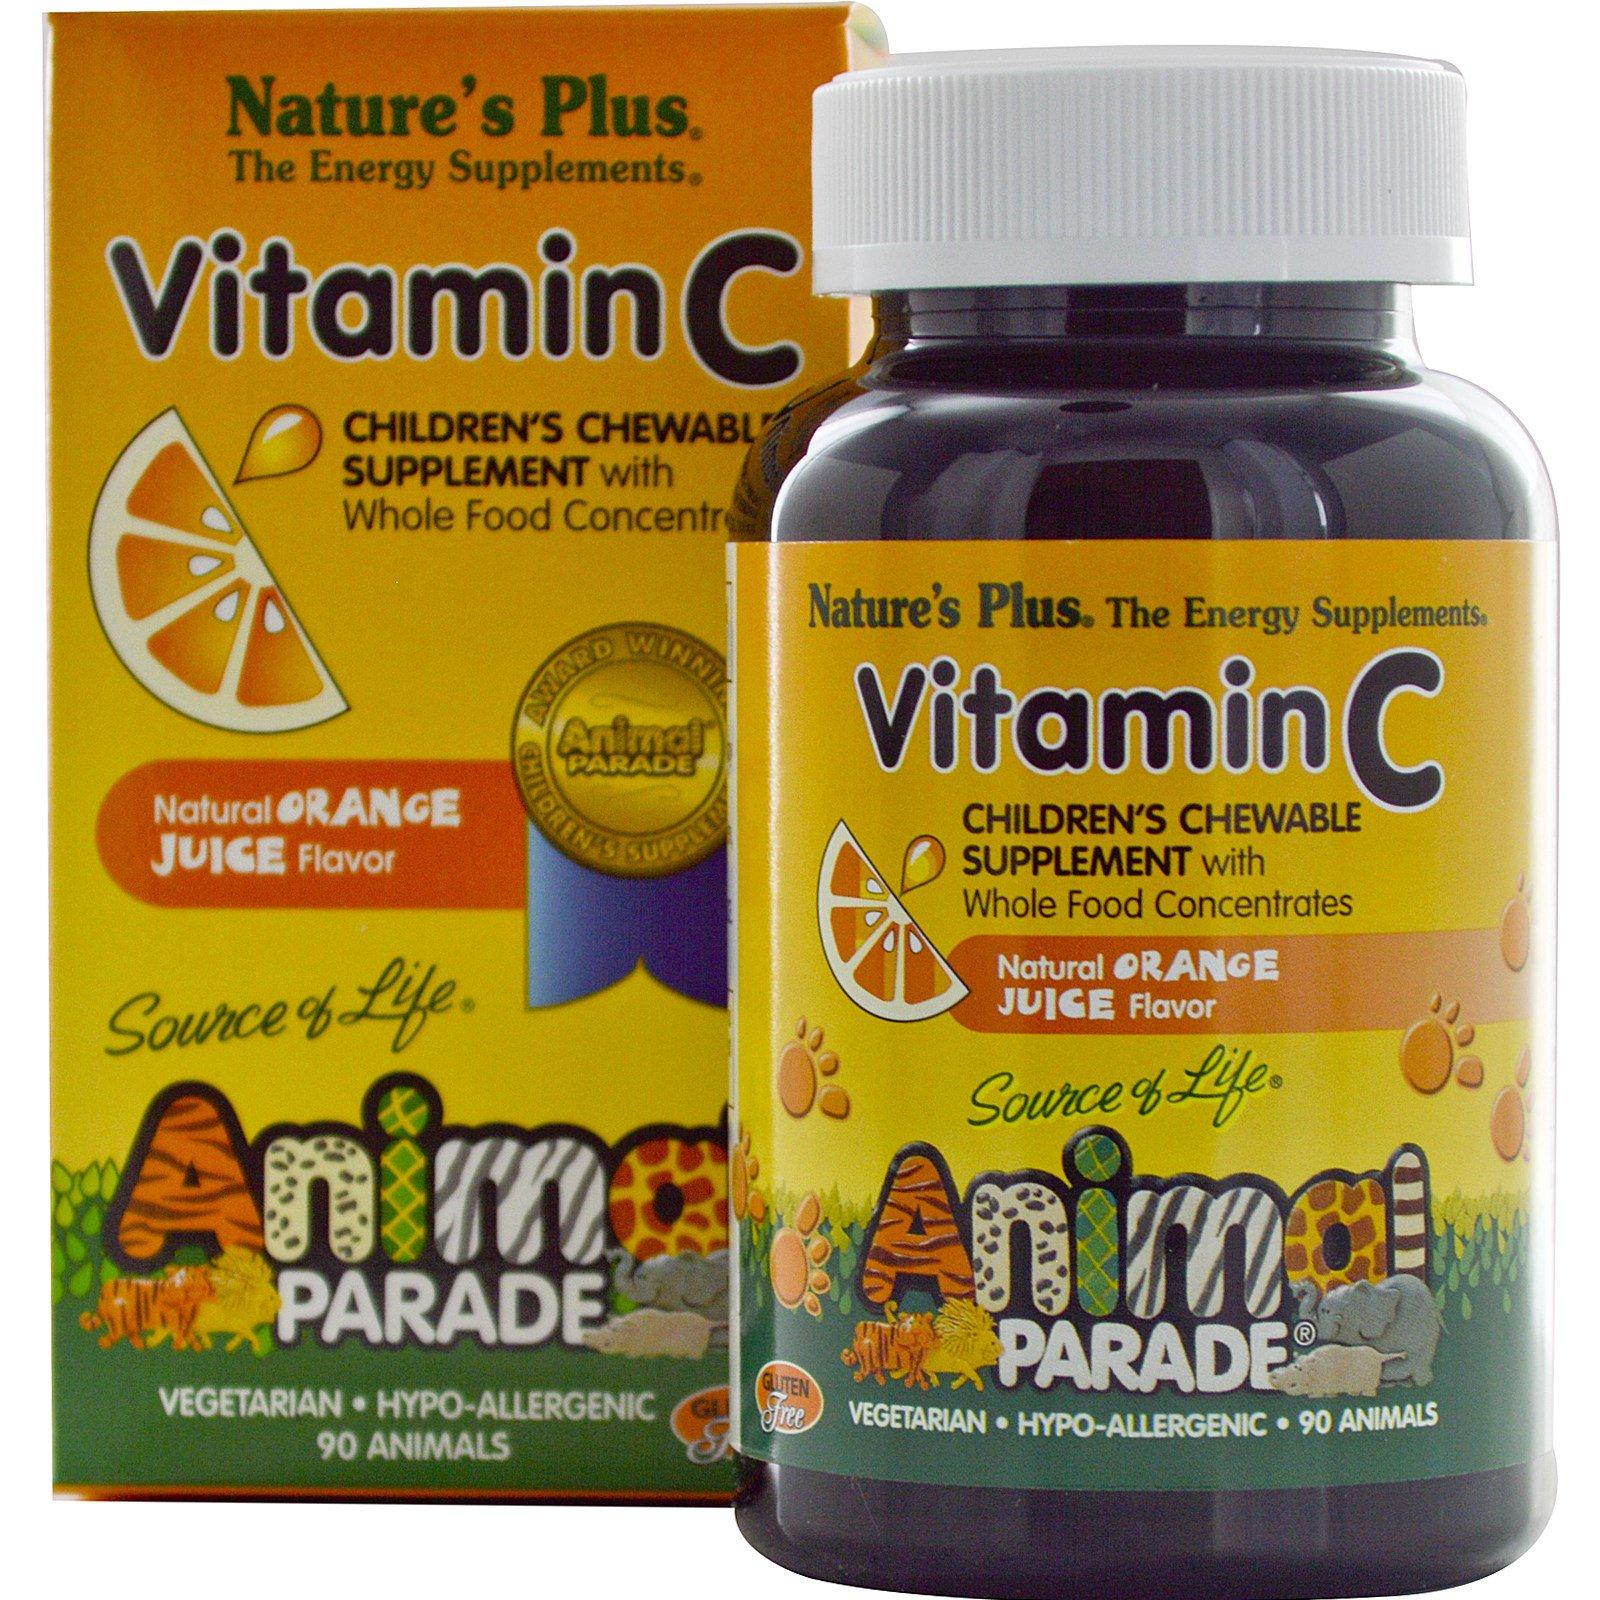 Image of Vitamin C, Children's Chewable Supplement, Natural Orange Juice Flavor (90 Animals) - Nature's Plus 0097467299986